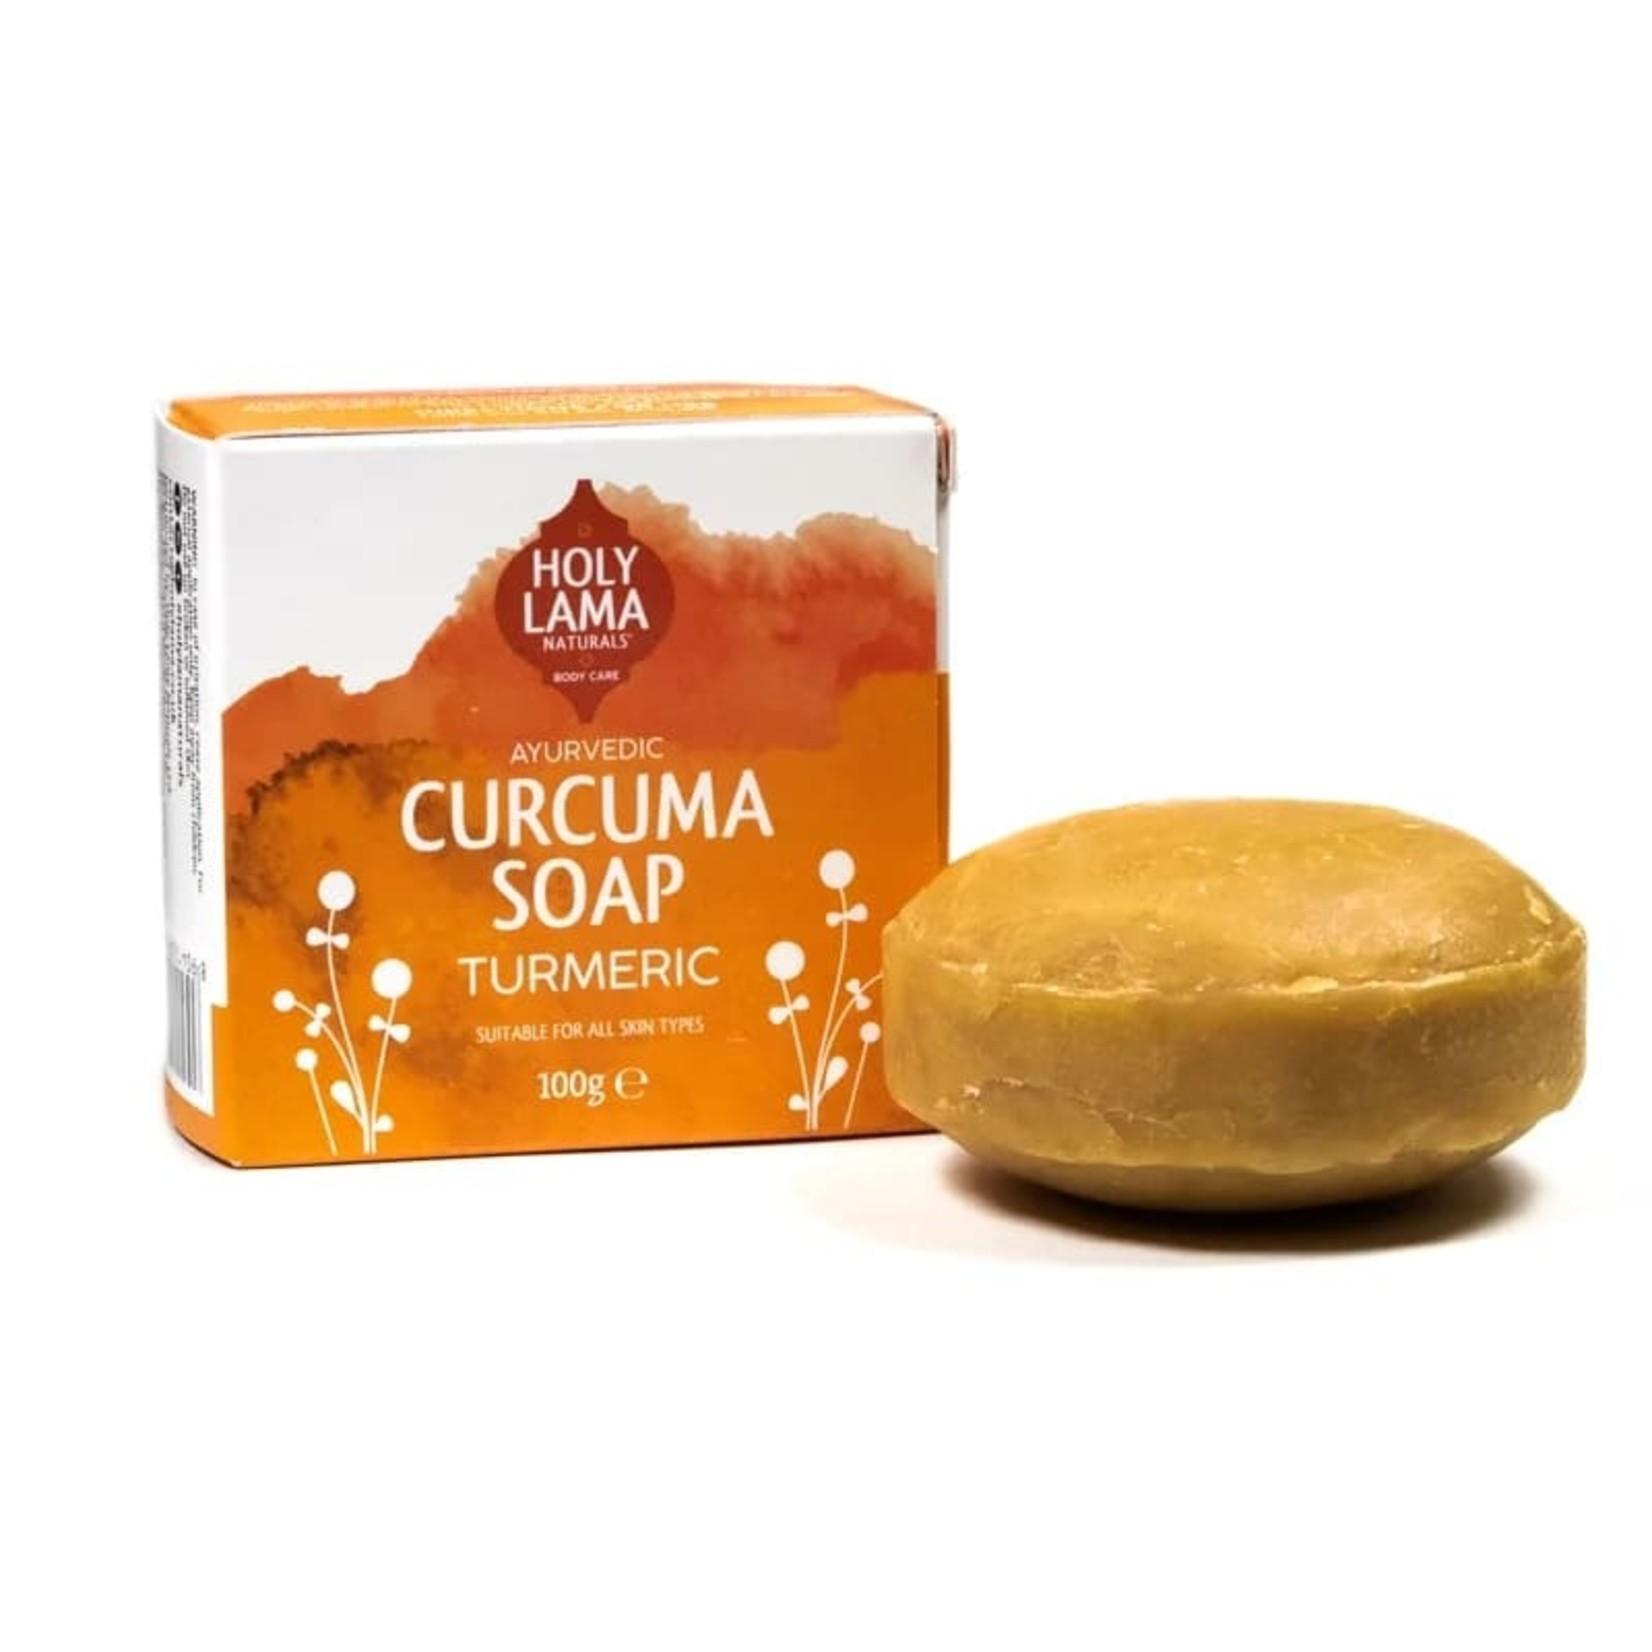 "Holy Lama Antibacteriële Ayurvedische zeep ""Curcuma"" met kokosolie en curcuma"